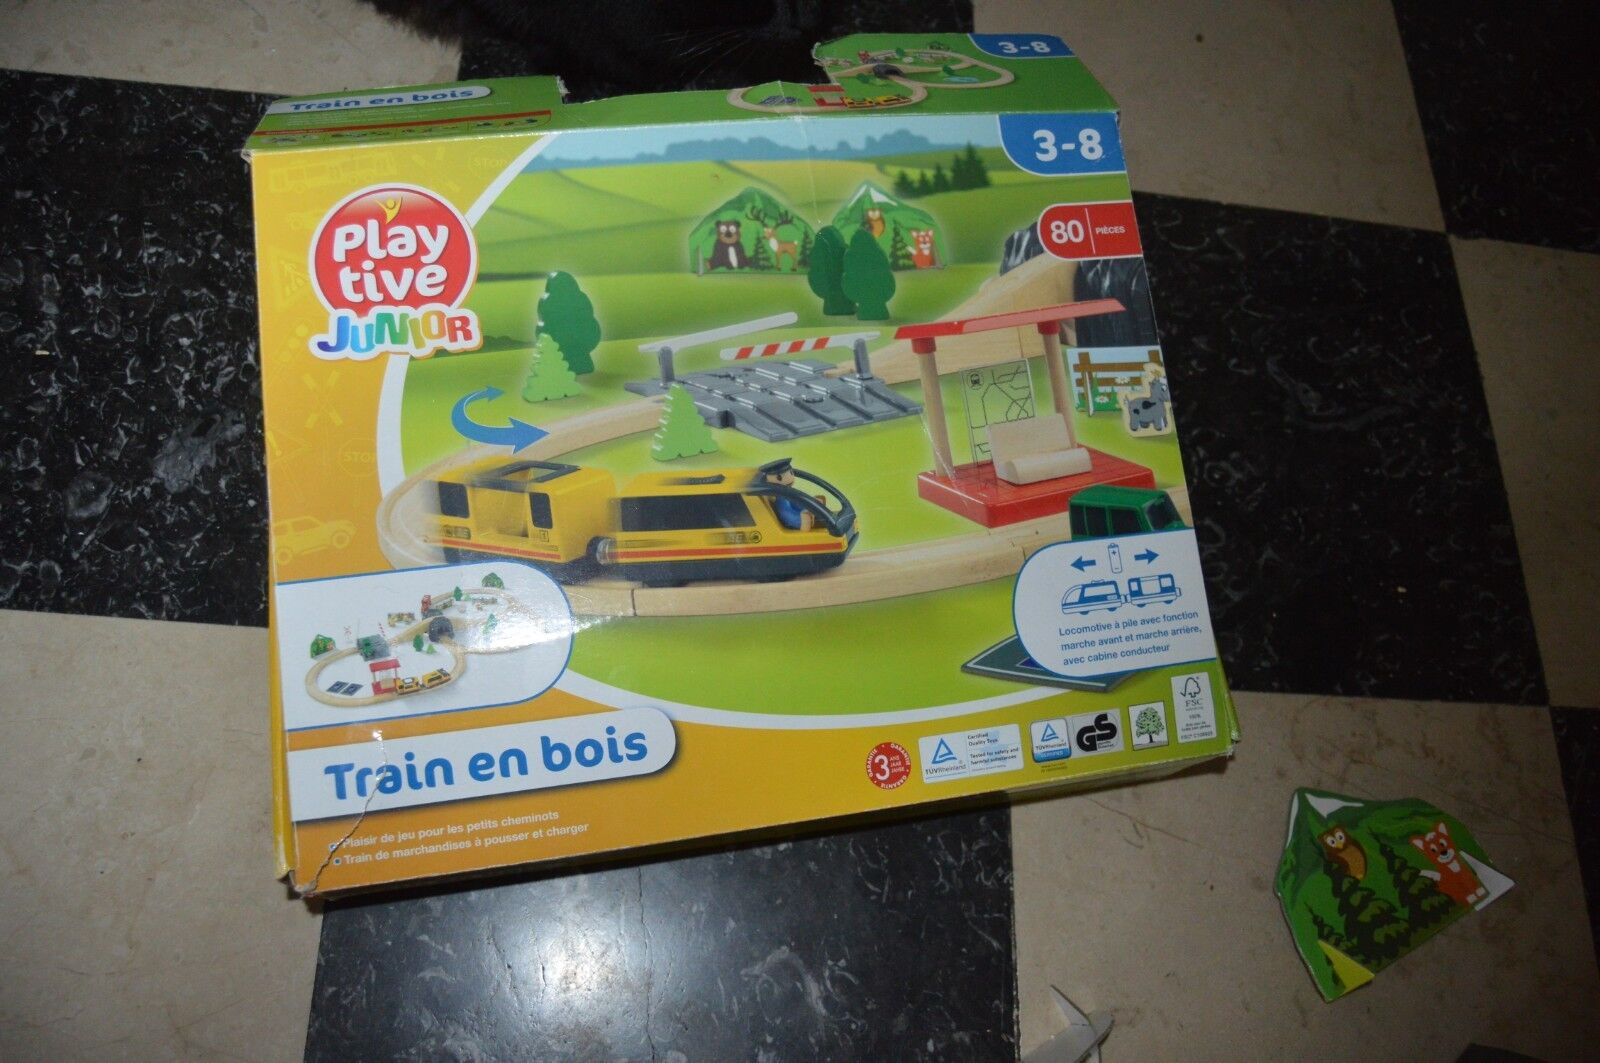 BOITE  TRAIN EN BOIS  RAIL  DECOR ANIMAUX  PLAY FIVE JUNIOR FONCTIONNE LOCO